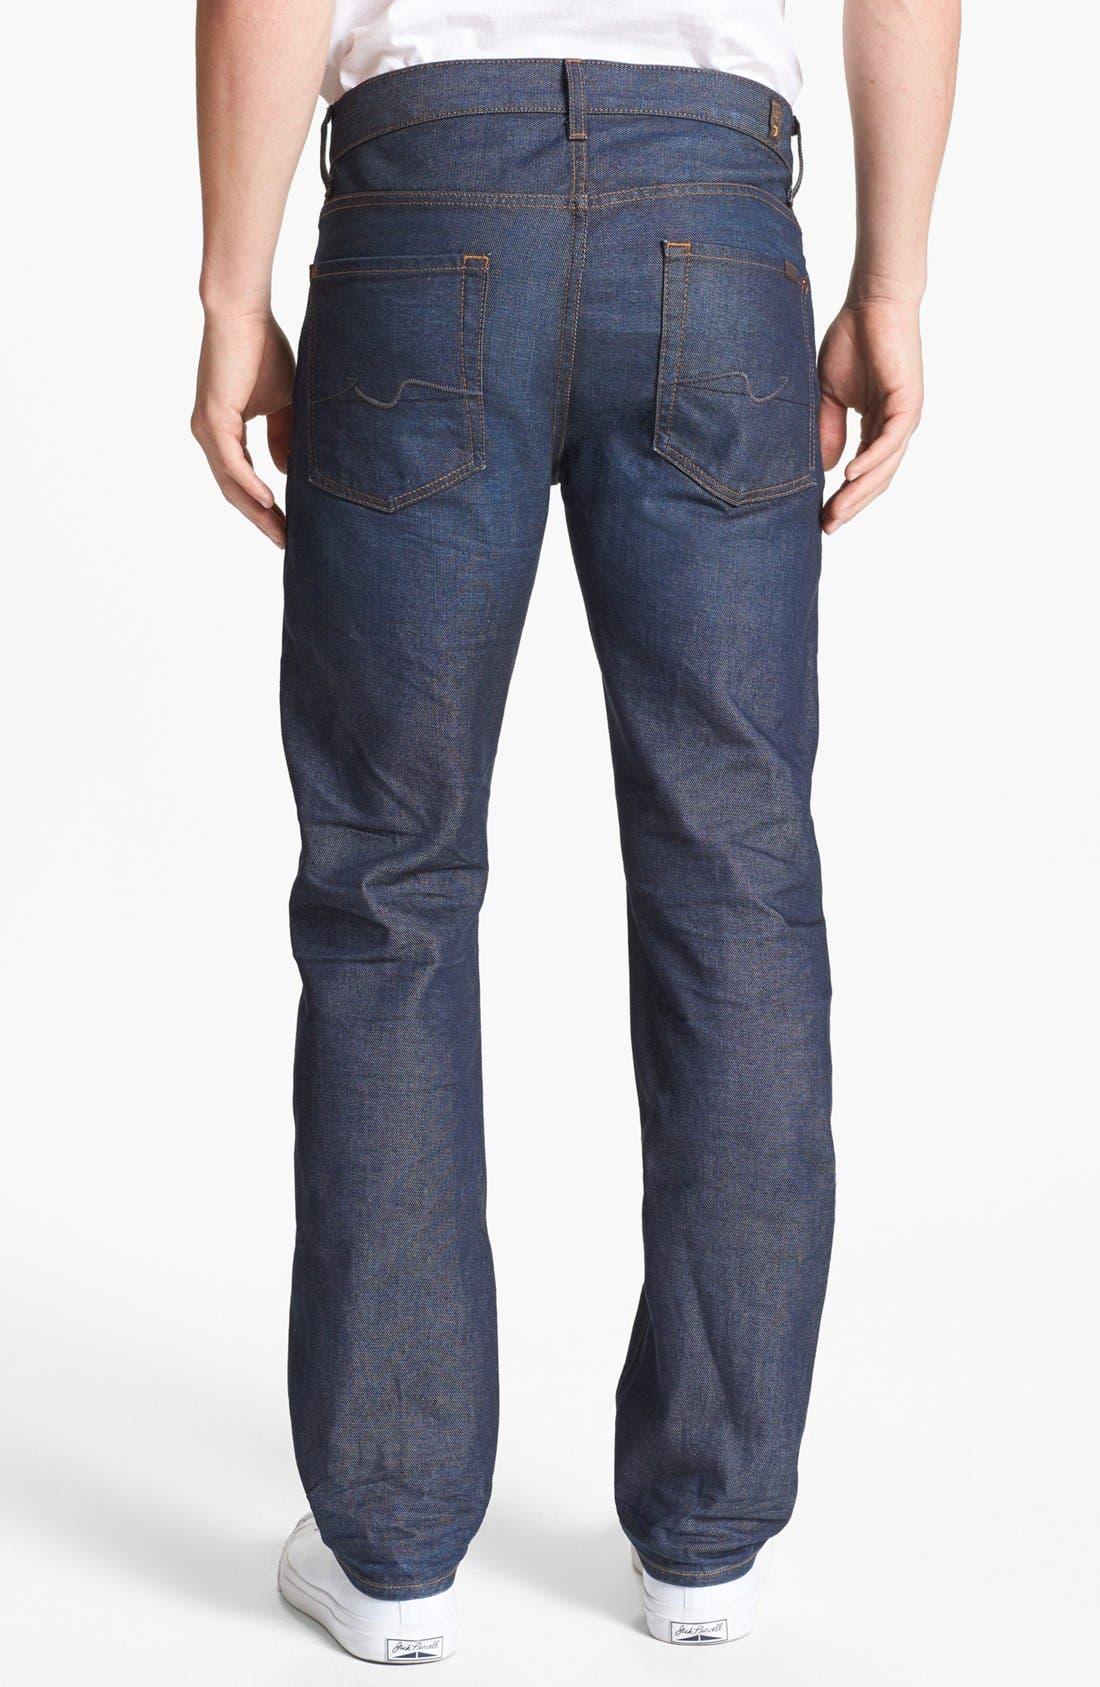 Alternate Image 1 Selected - 7 For All Mankind® 'Slimmy' Slim Fit Jeans (Copper River)